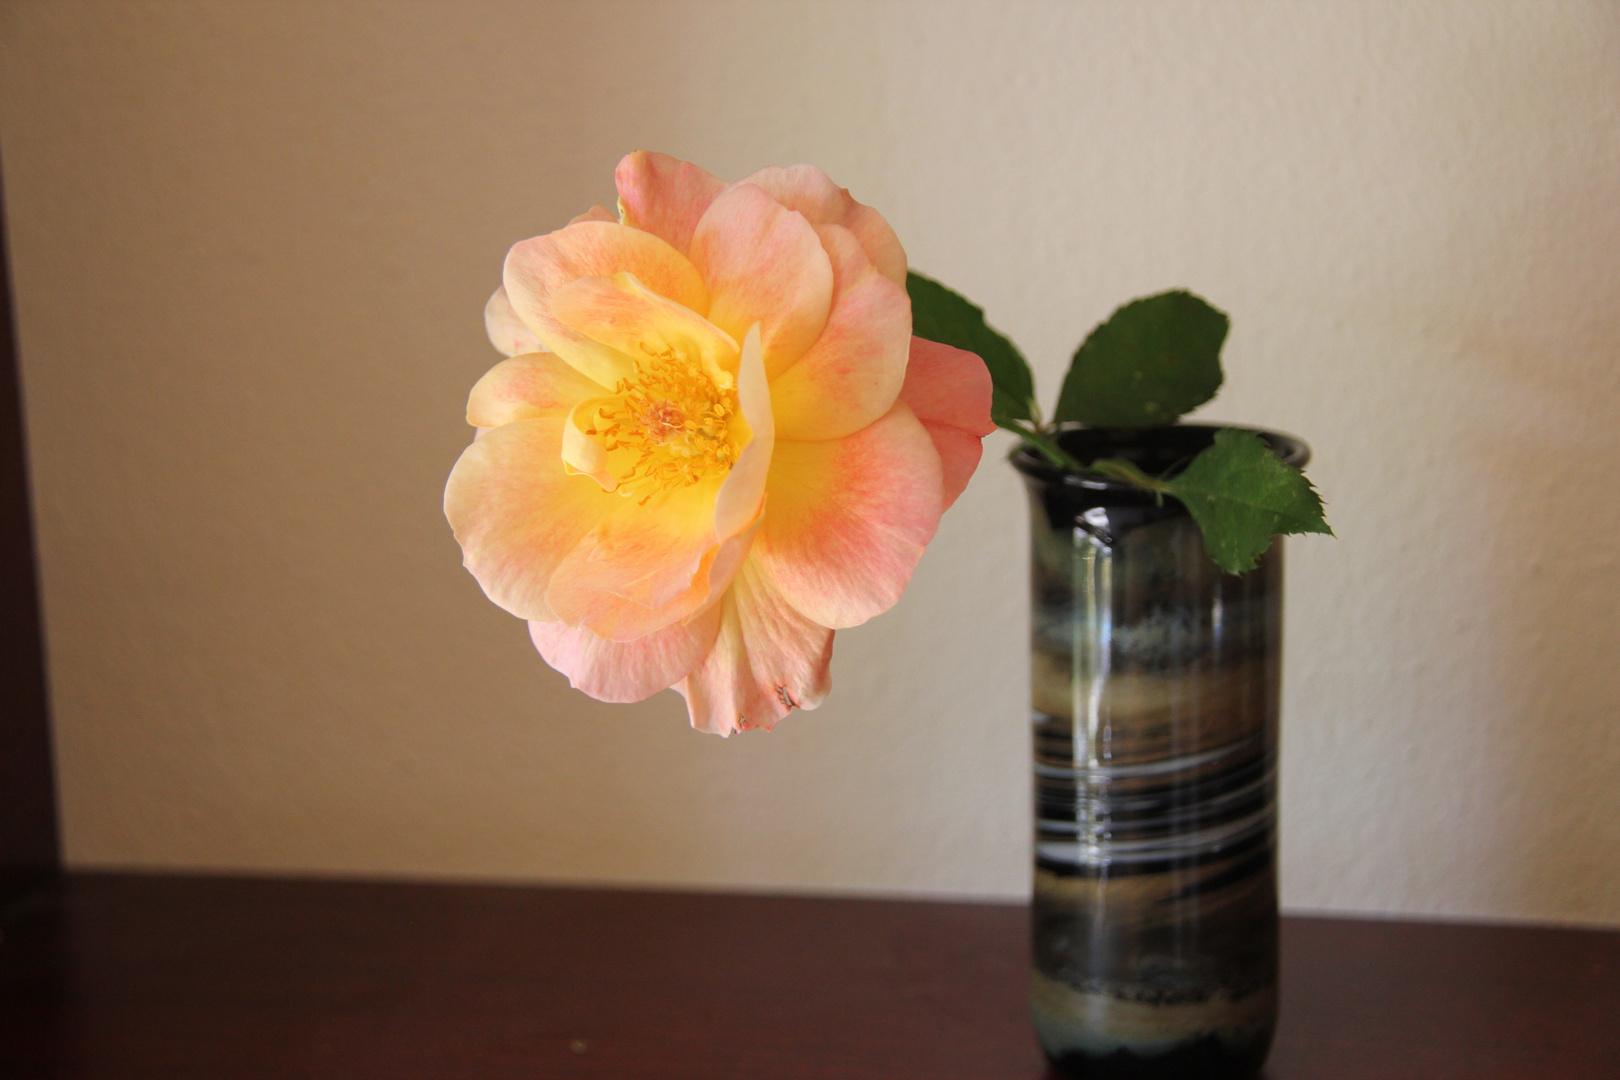 Tis the last Rose of Summer....